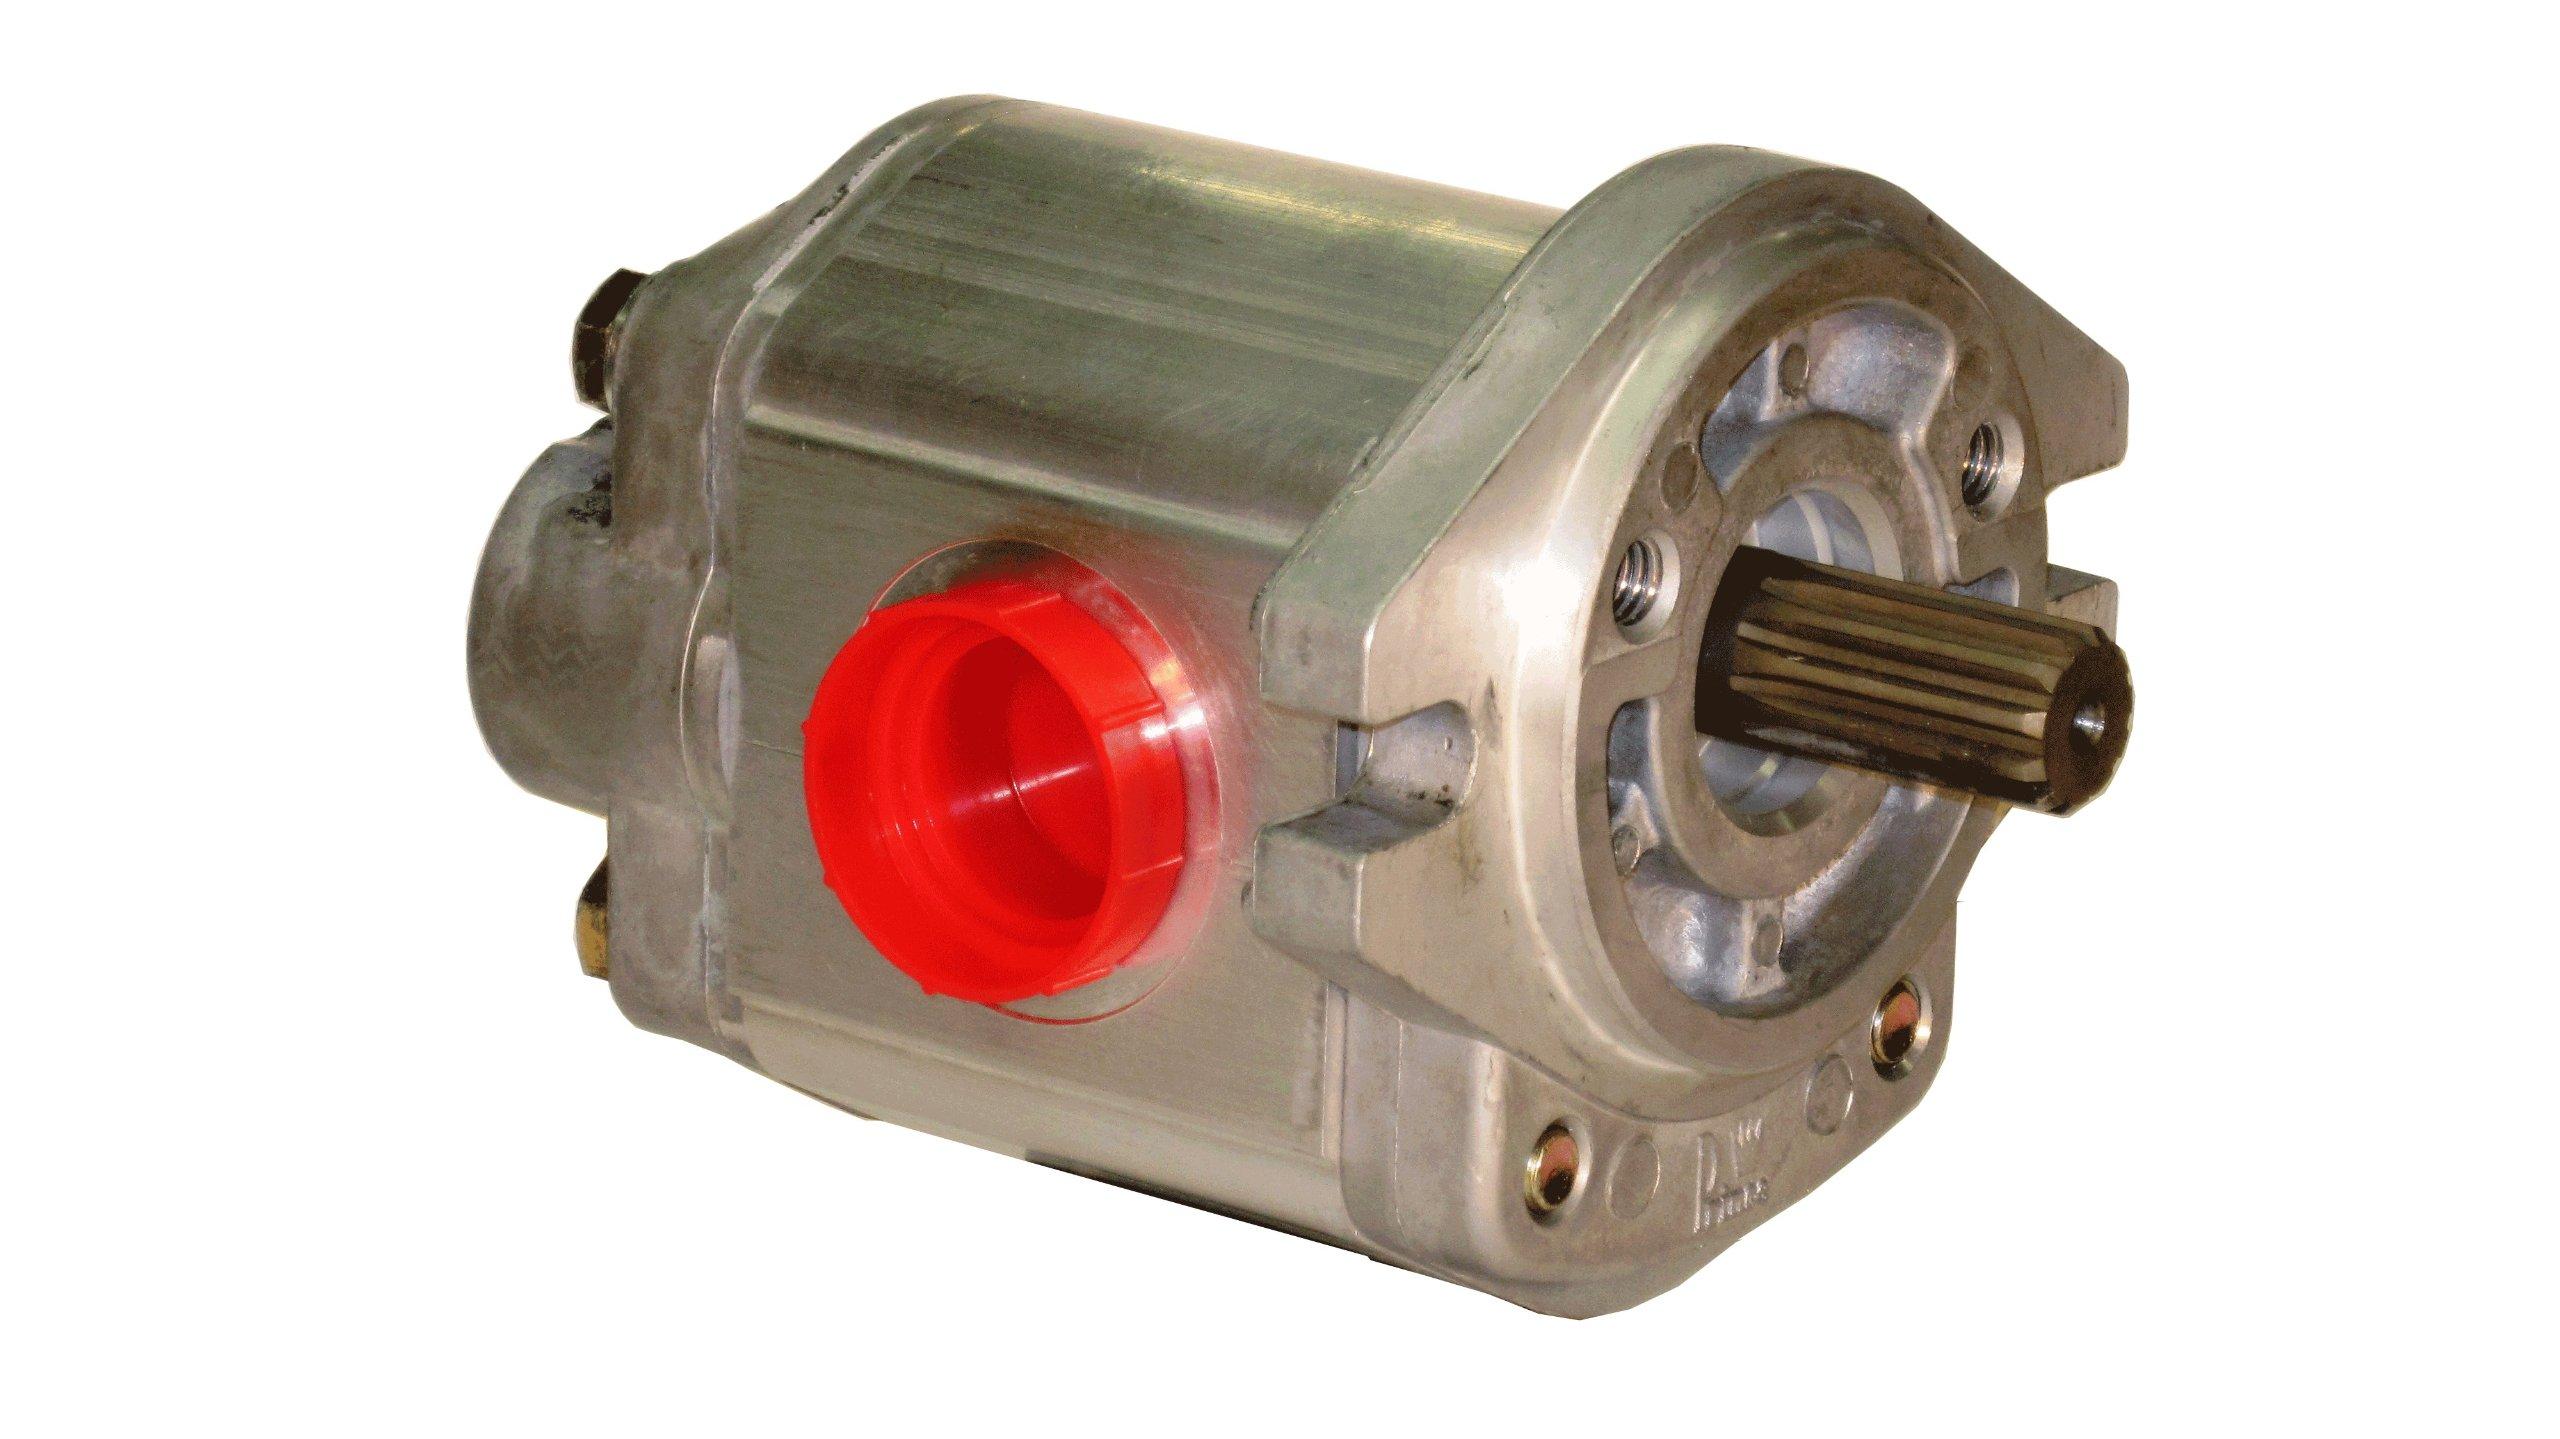 Prince Manufacturing SP20B30A6H5-R Hydraulic Gear Pump, 43.80 HP Motor, 2500 PSI Maximum Pressure, 26.86 GPM Maximum Flow Rate, Clockwise Rotation, Self-Lubricating, SAE A Flange, Aluminum